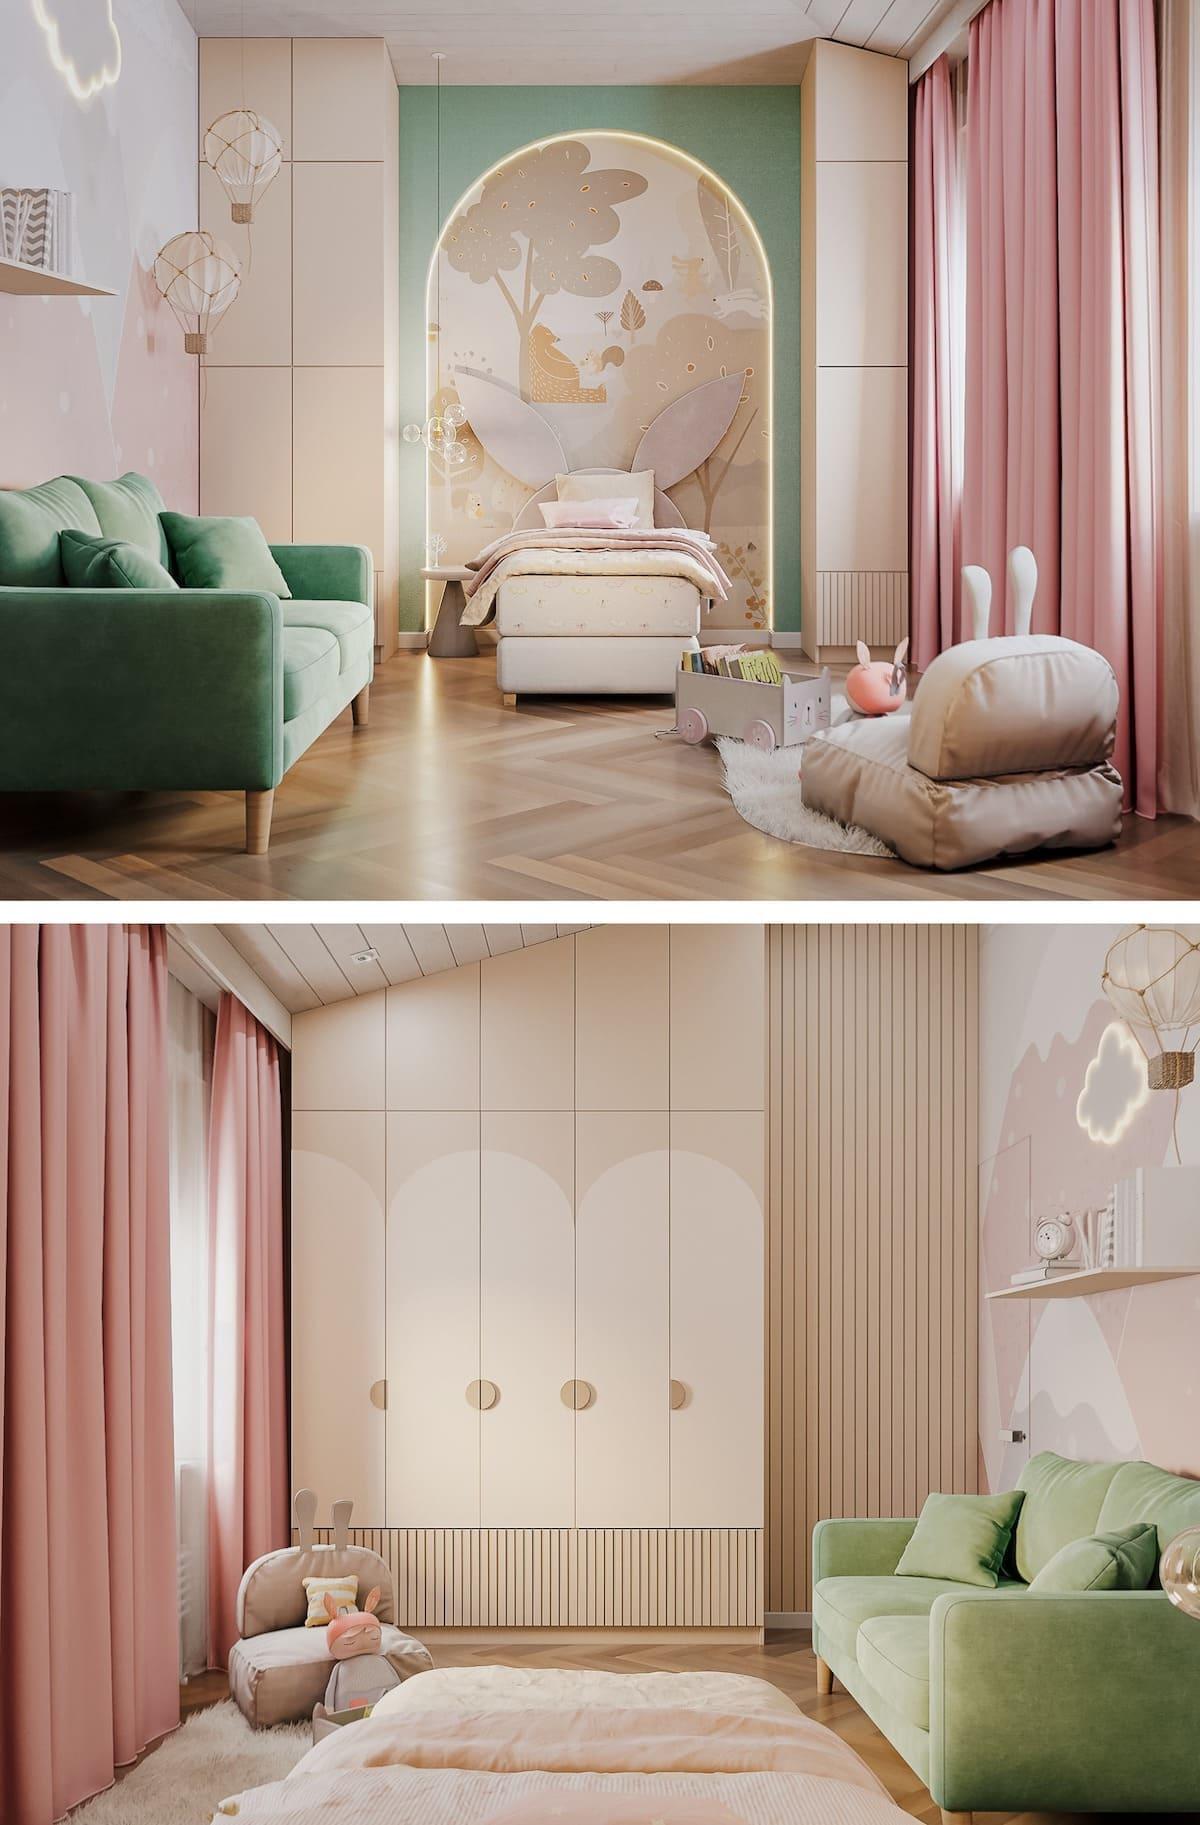 интерьер детской комнаты фото 80